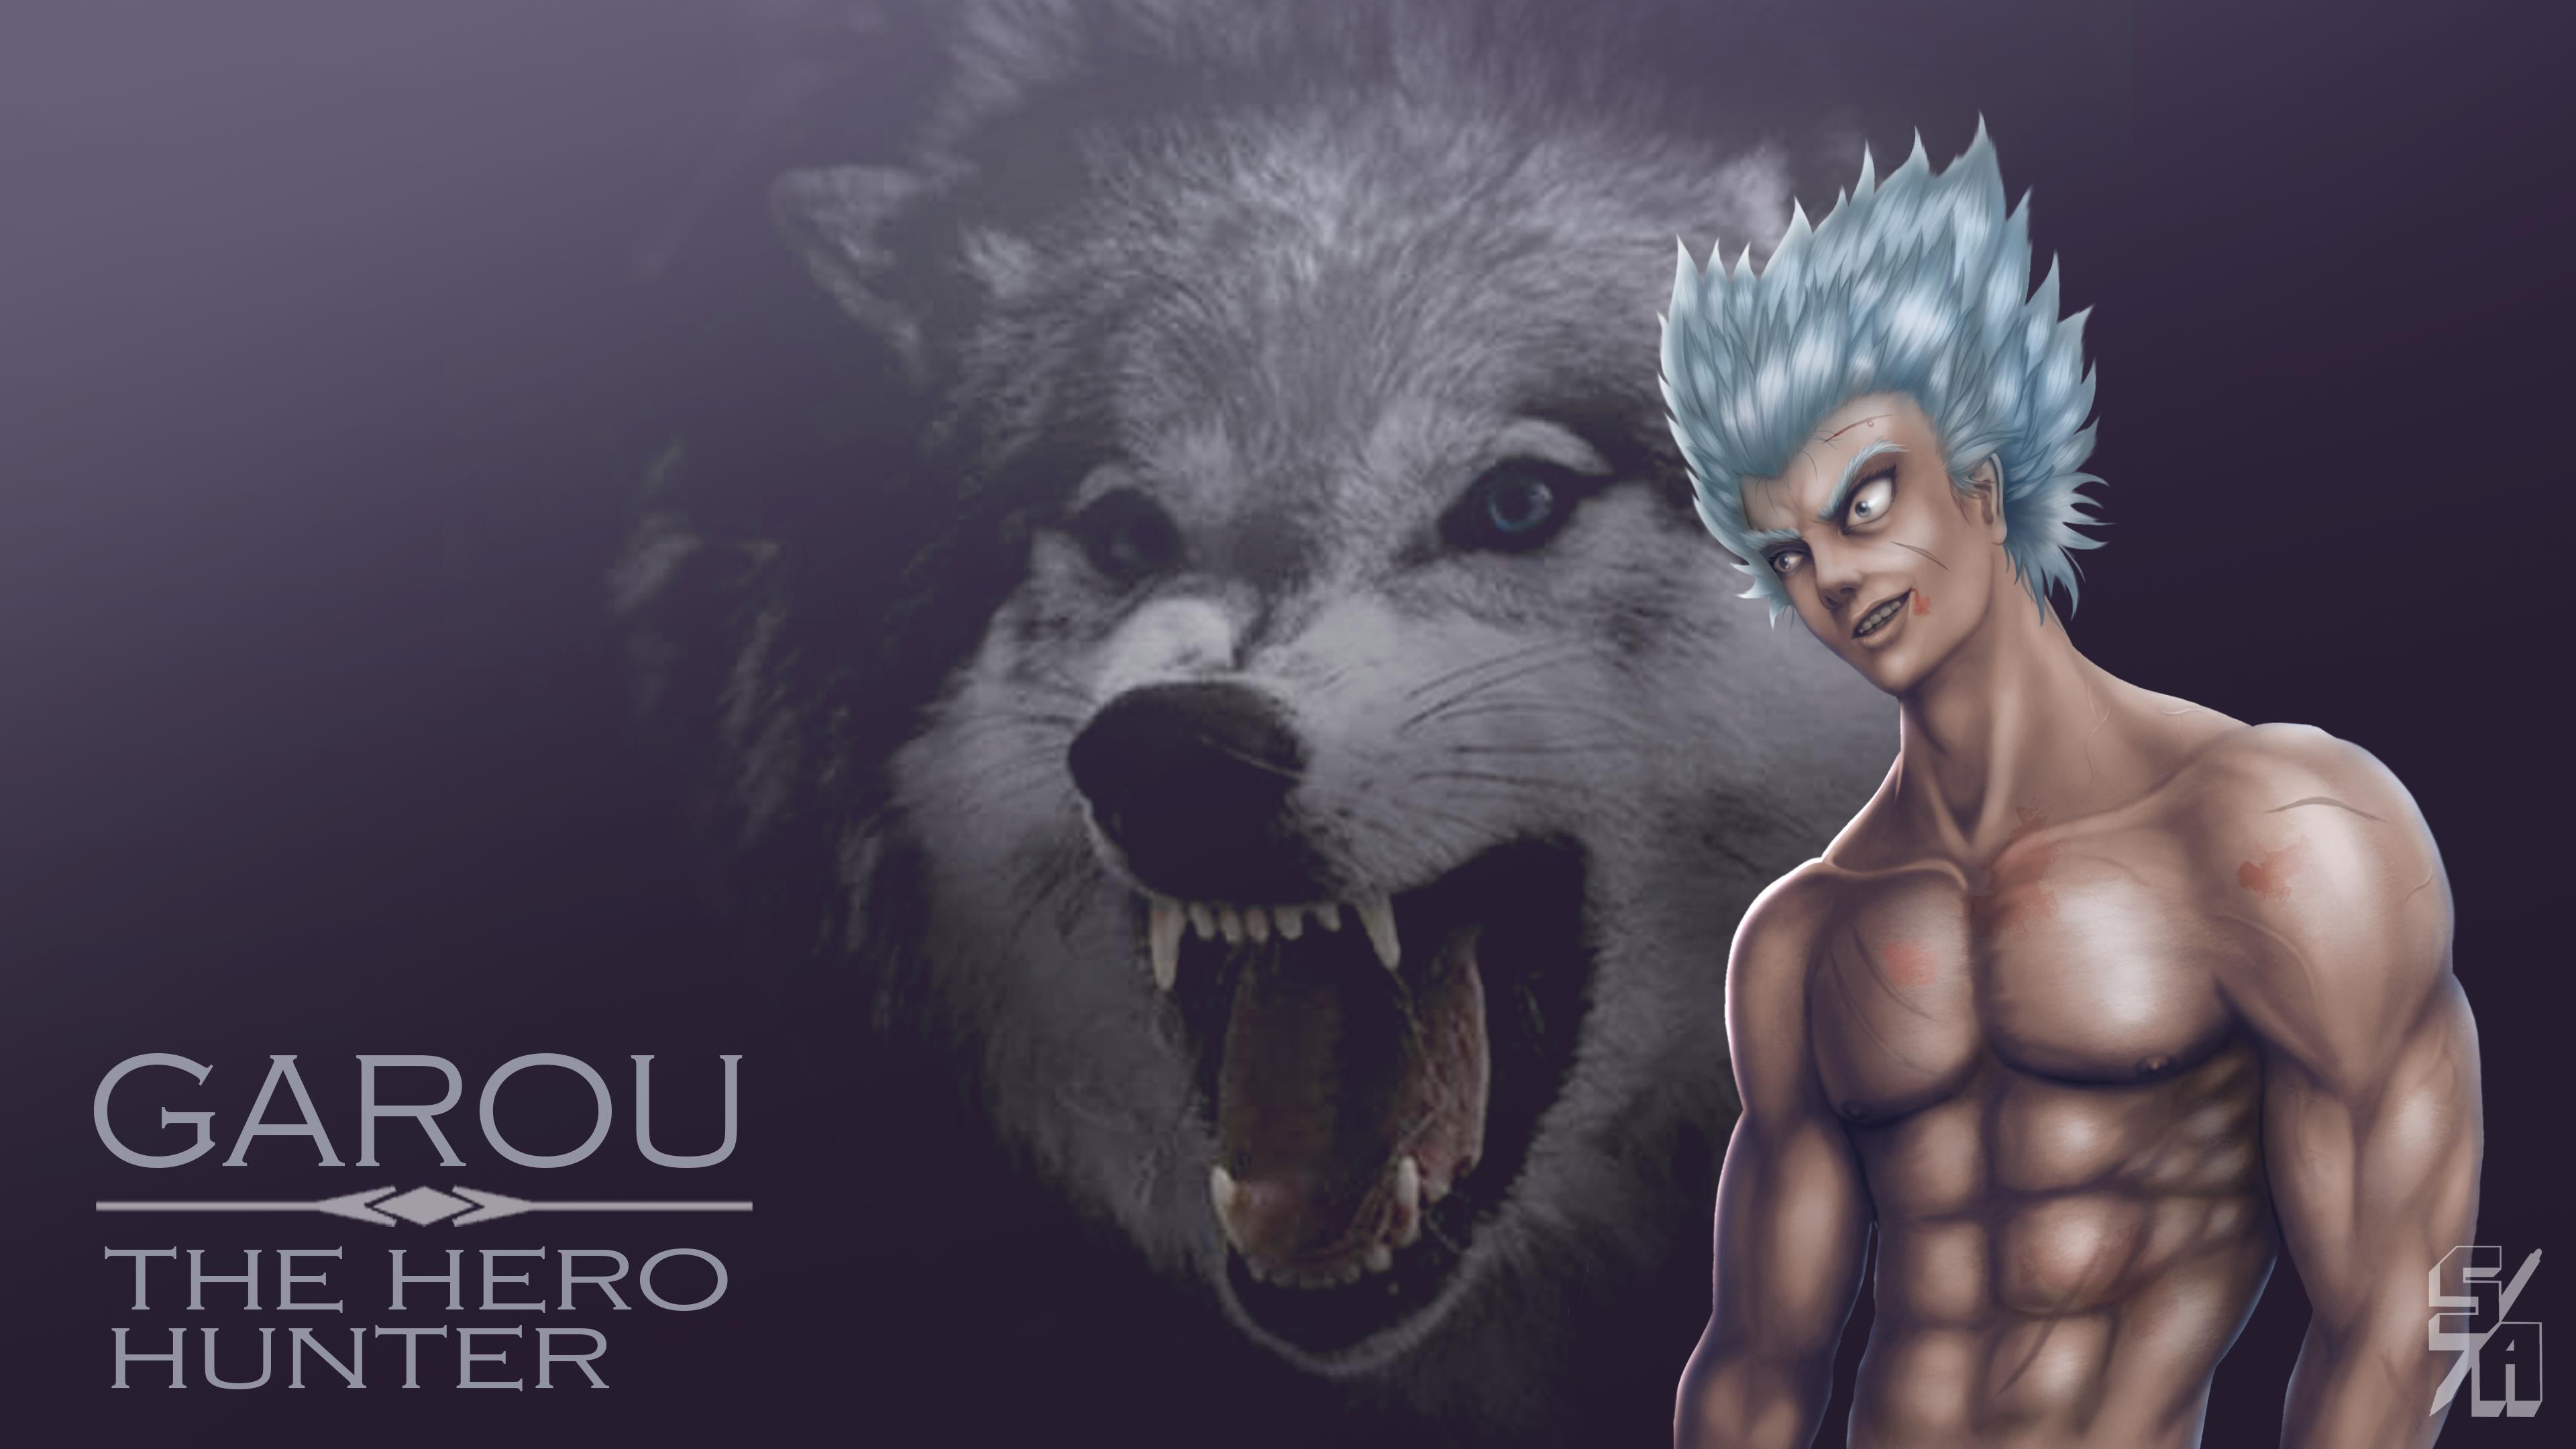 Anime 3840x2160 wolf wolf Garou One-Punch Man anime Shounen Saitama Genos super villain villains hero